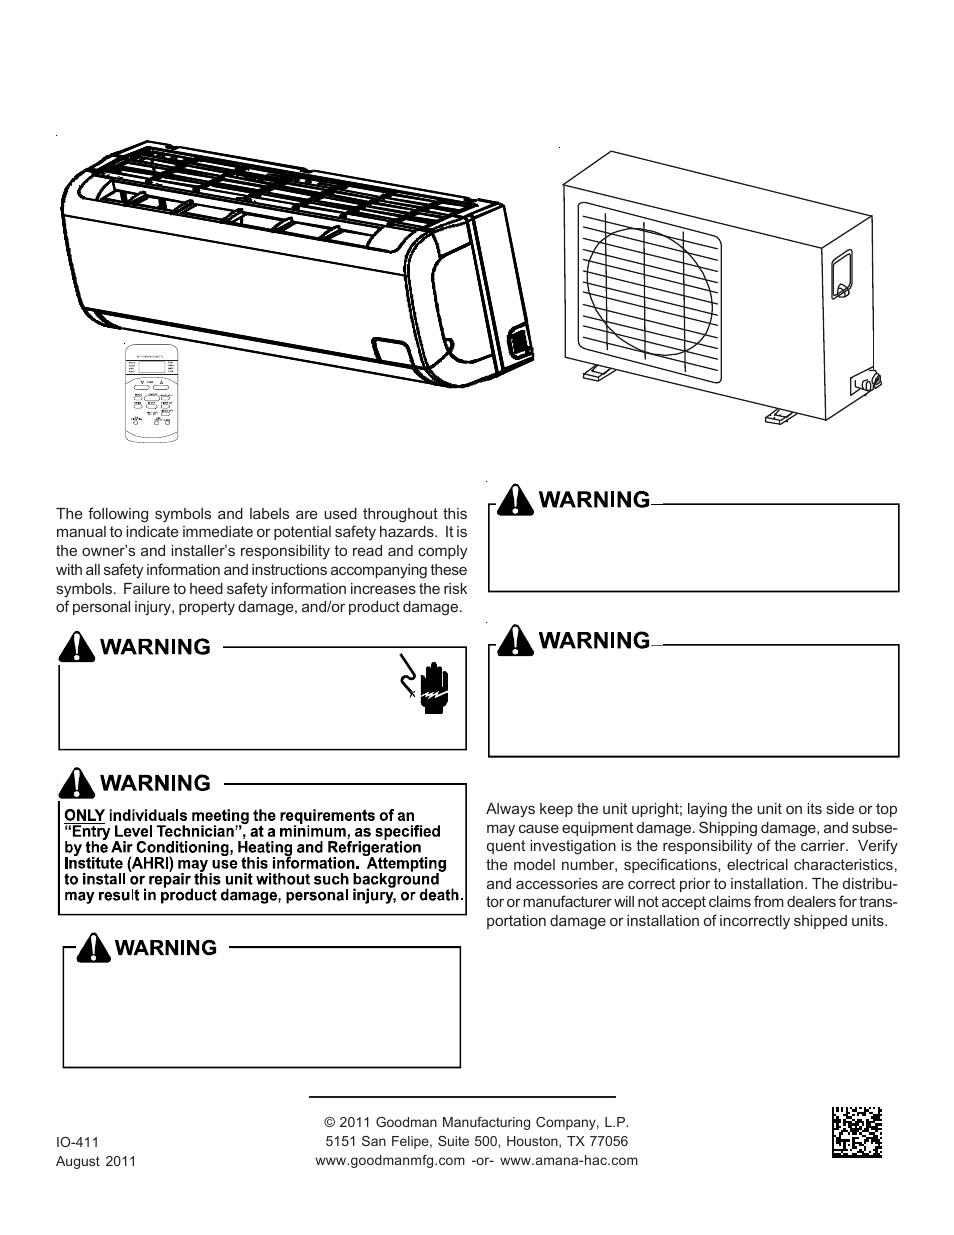 medium resolution of goodman mfg split type room air conditioner and heat pump 000 12 user manual 12 pages also for split type room air conditioner and heat pump msc msh 9